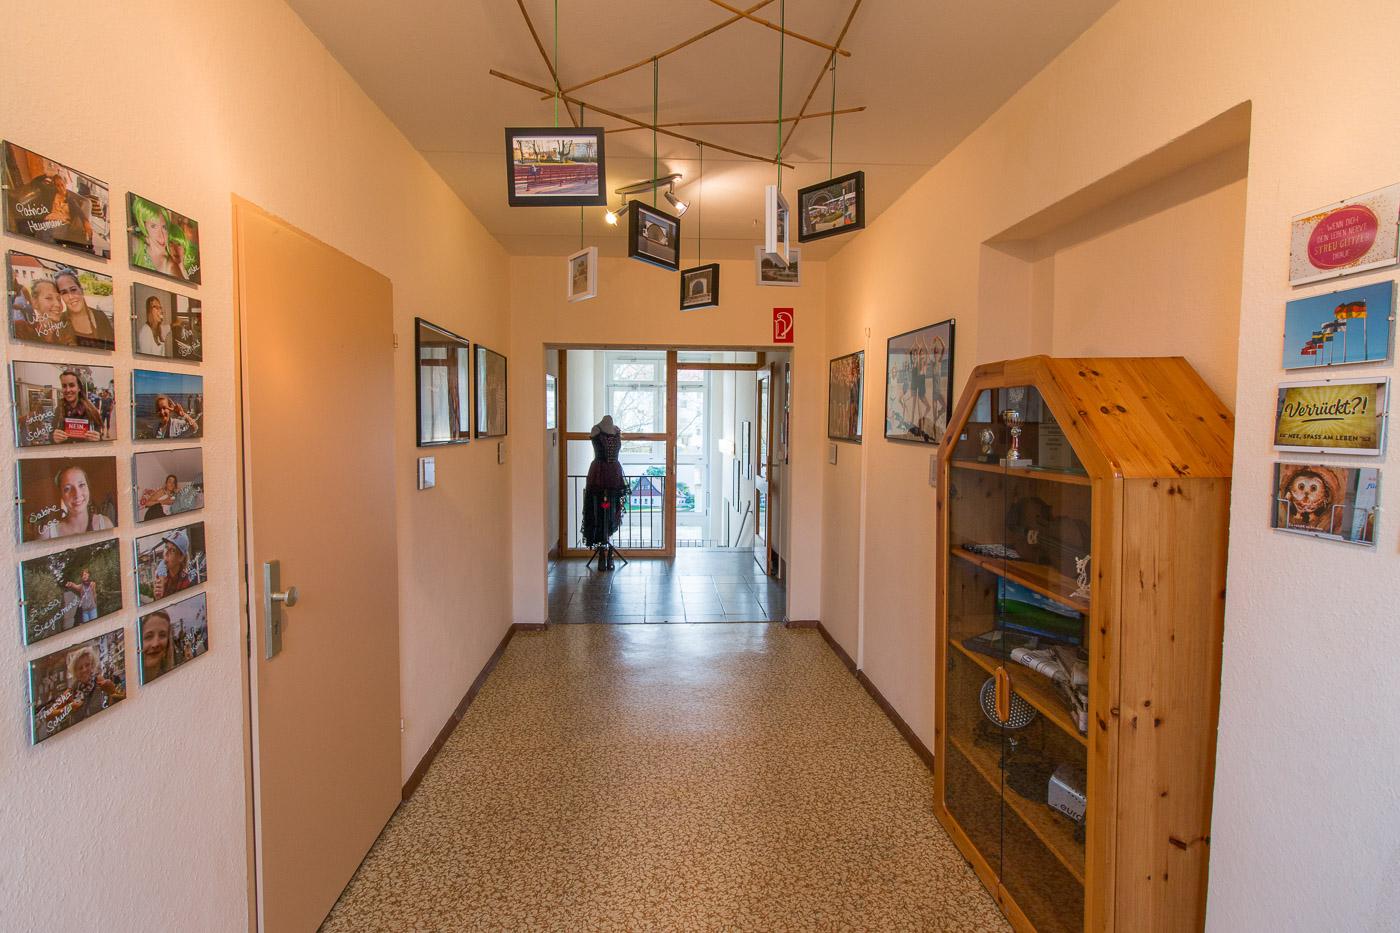 Korridor in der 1. Etage